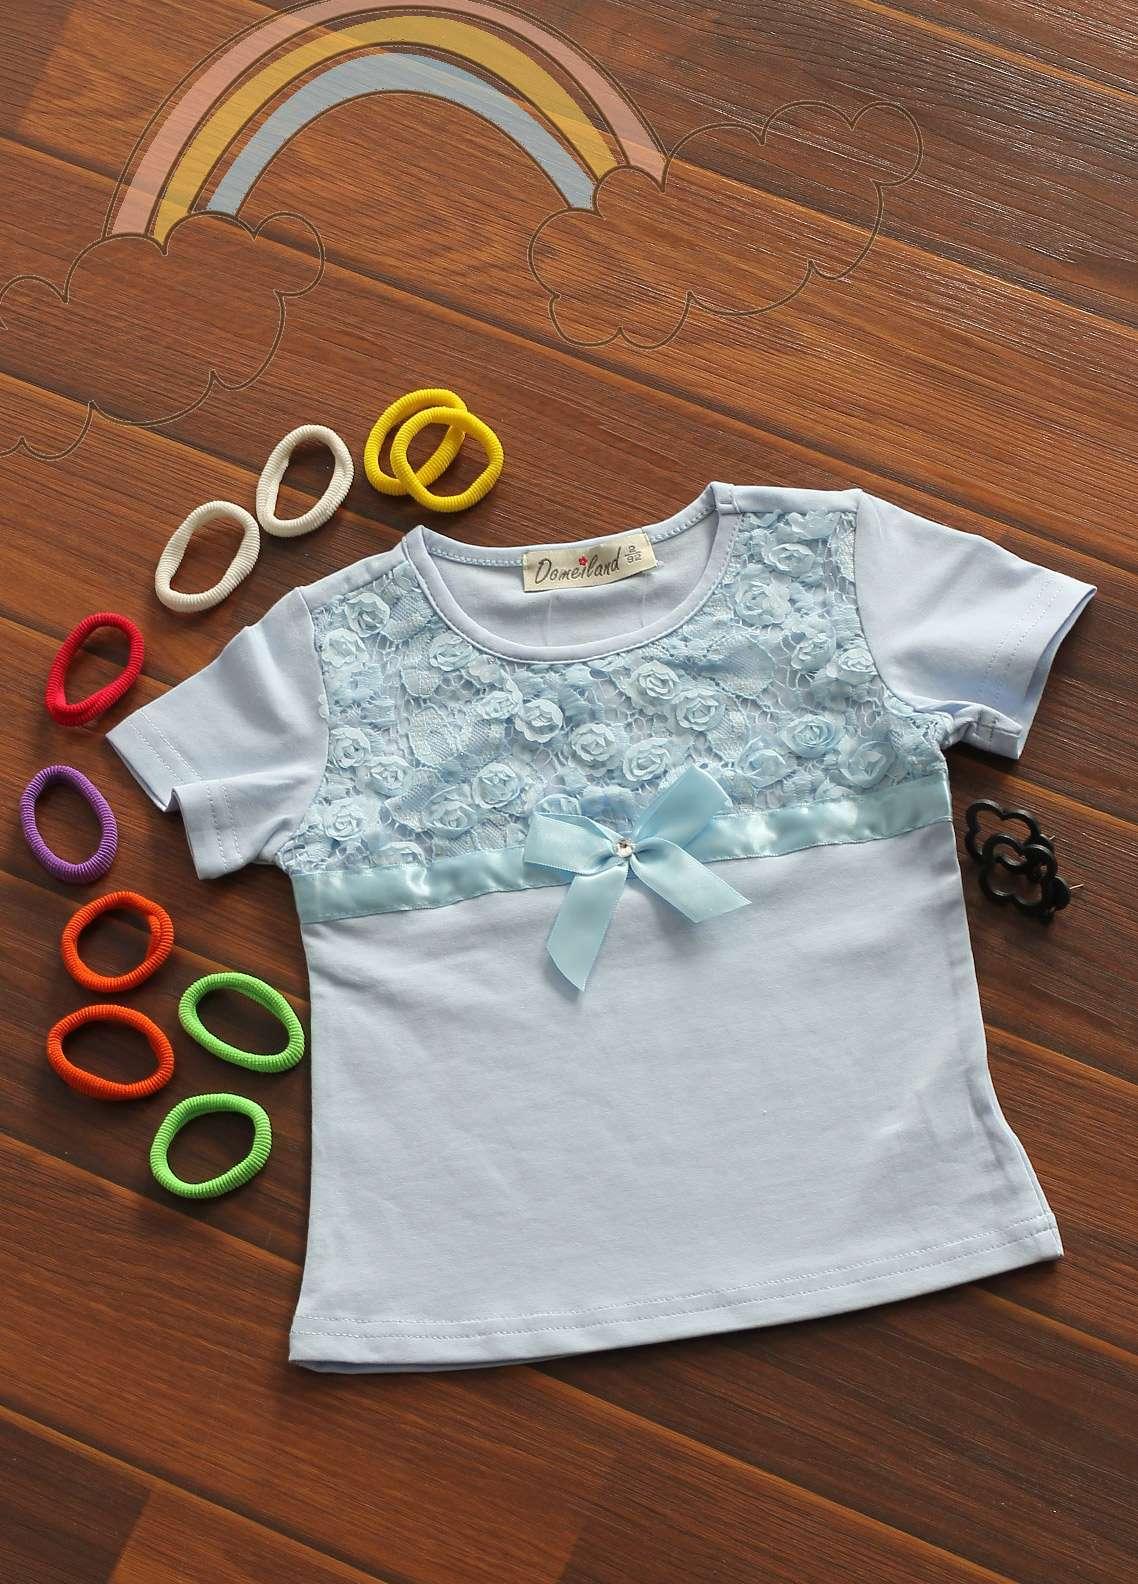 Sanaulla Exclusive Range Cotton Fancy Tees for Girls -  801799 Sky Blue